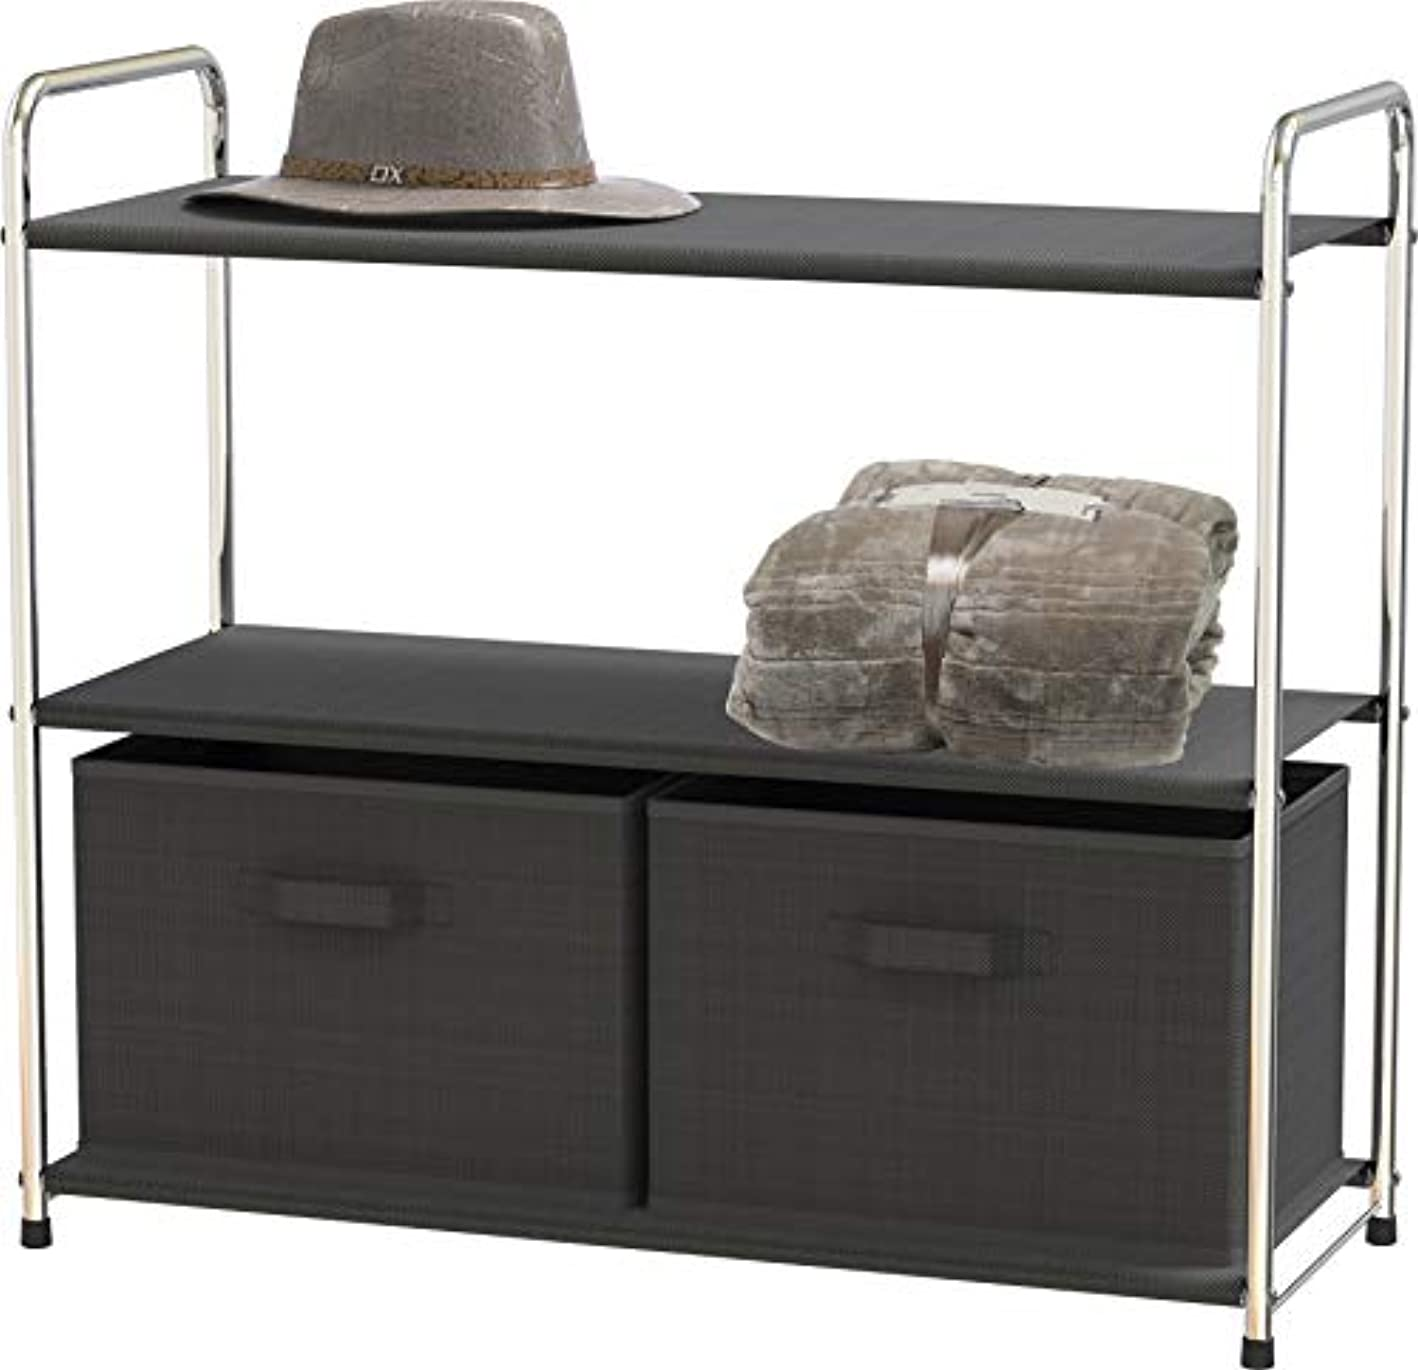 Simple Houseware 3-Tier Closet Storage with 2 Drawers, Dark Gray zohbjb0502804